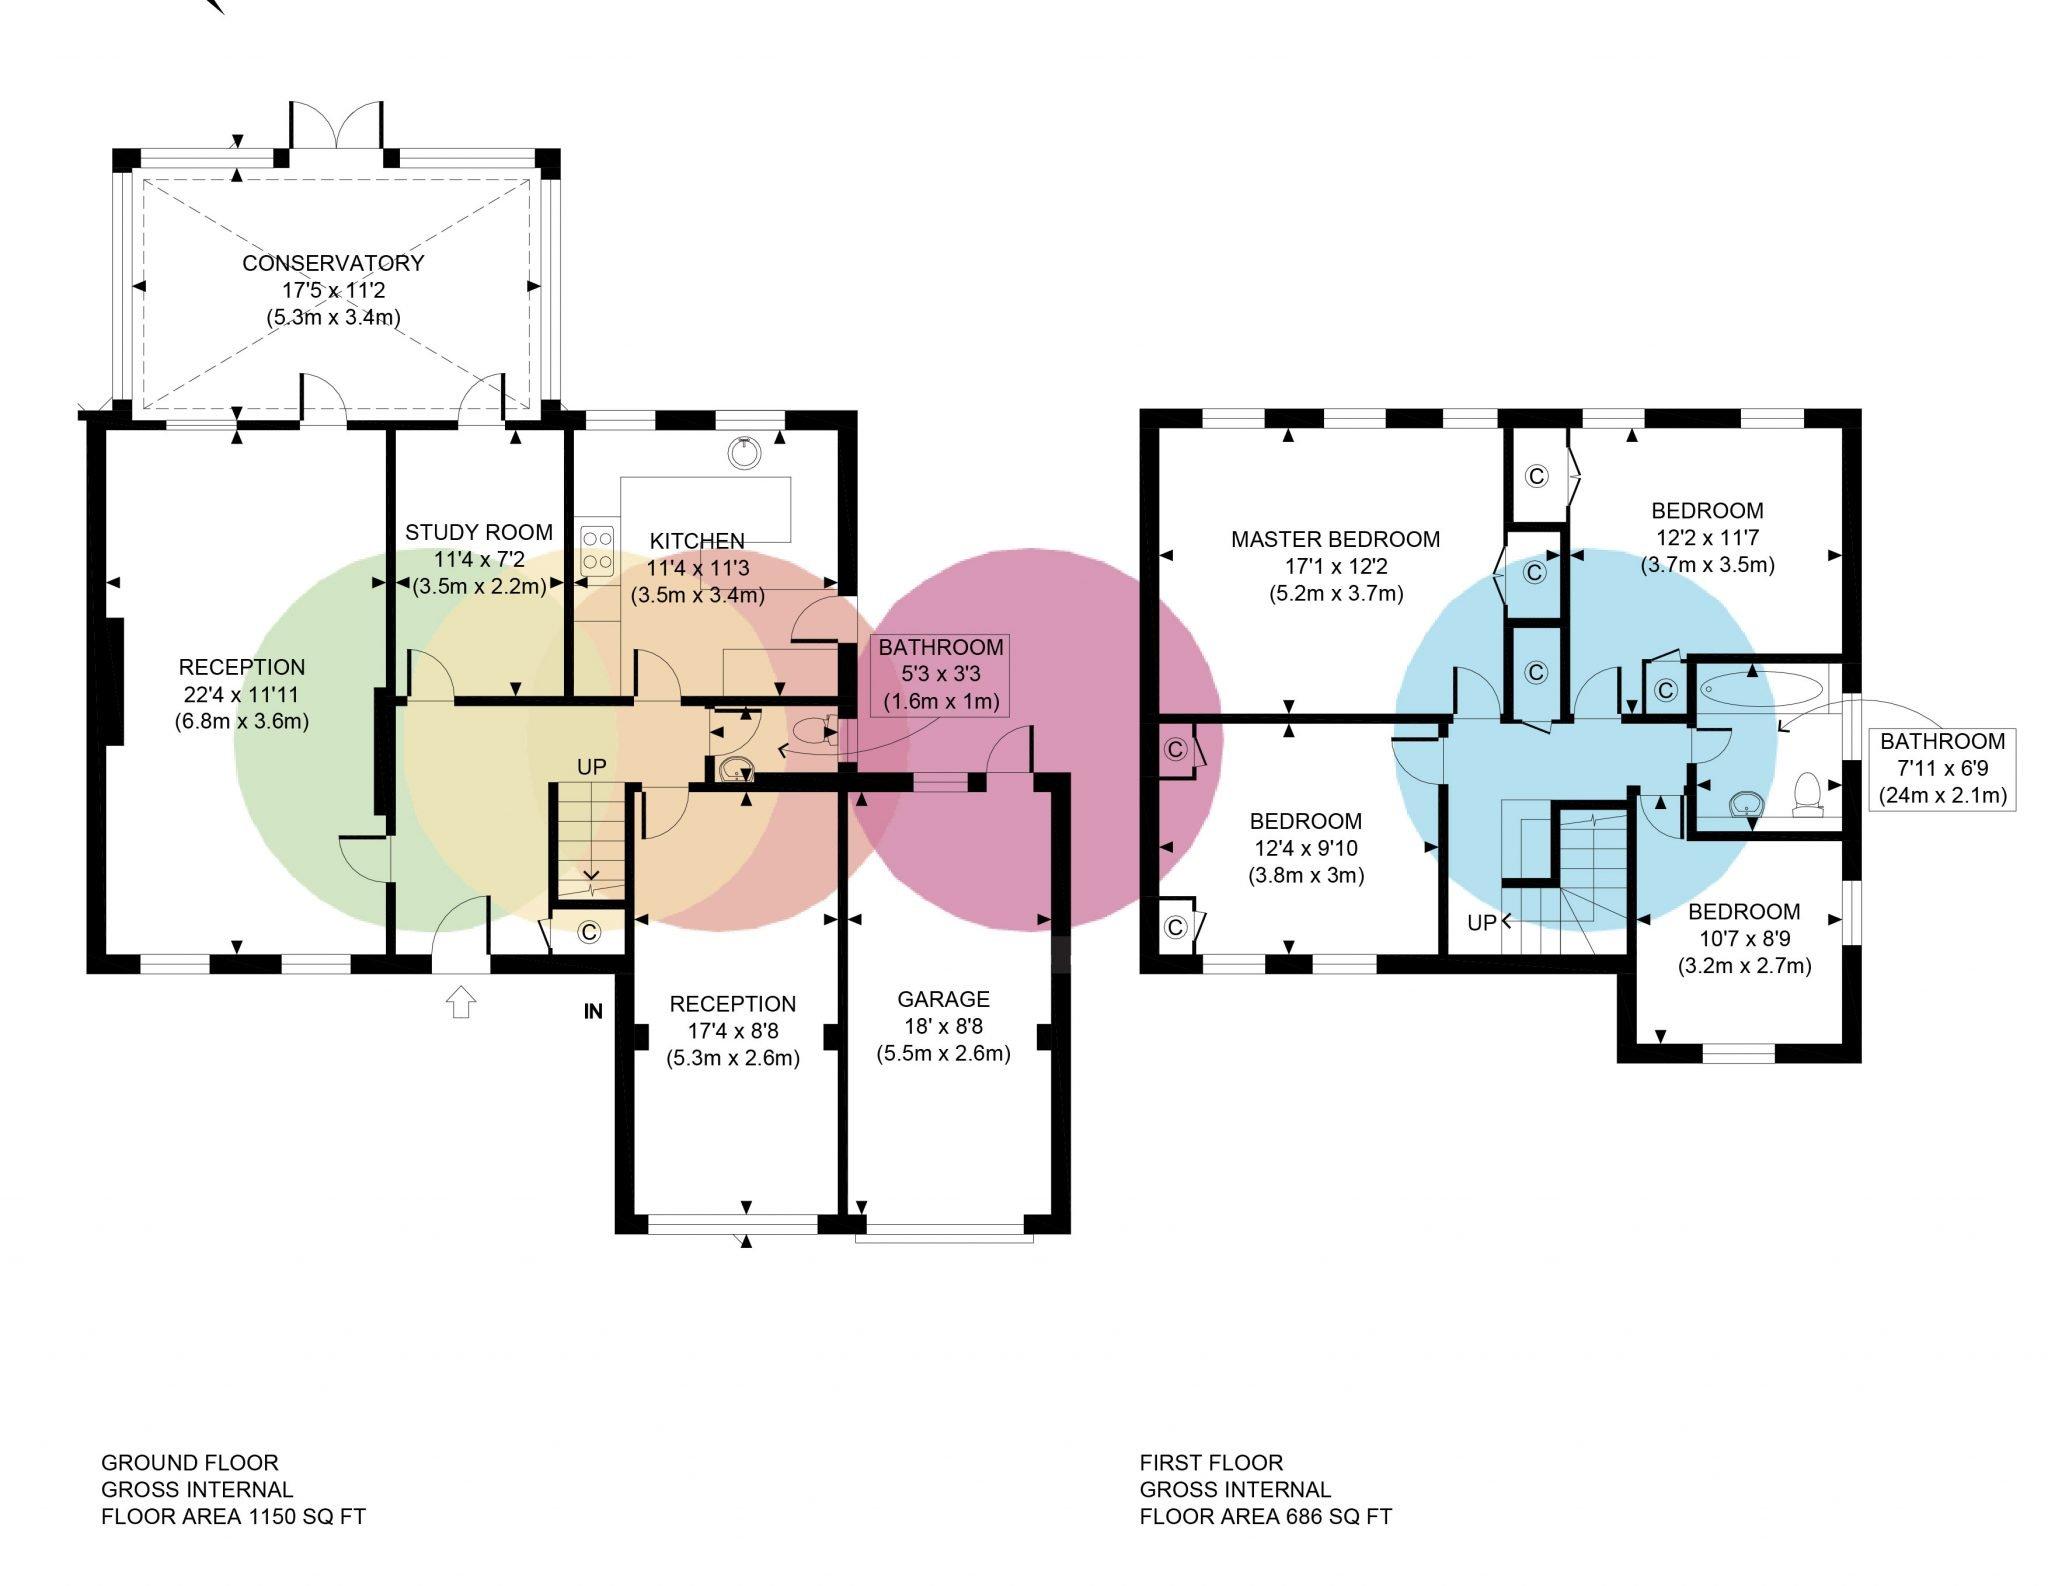 Property Floor Plans Lease Plans Interactive Floorplans